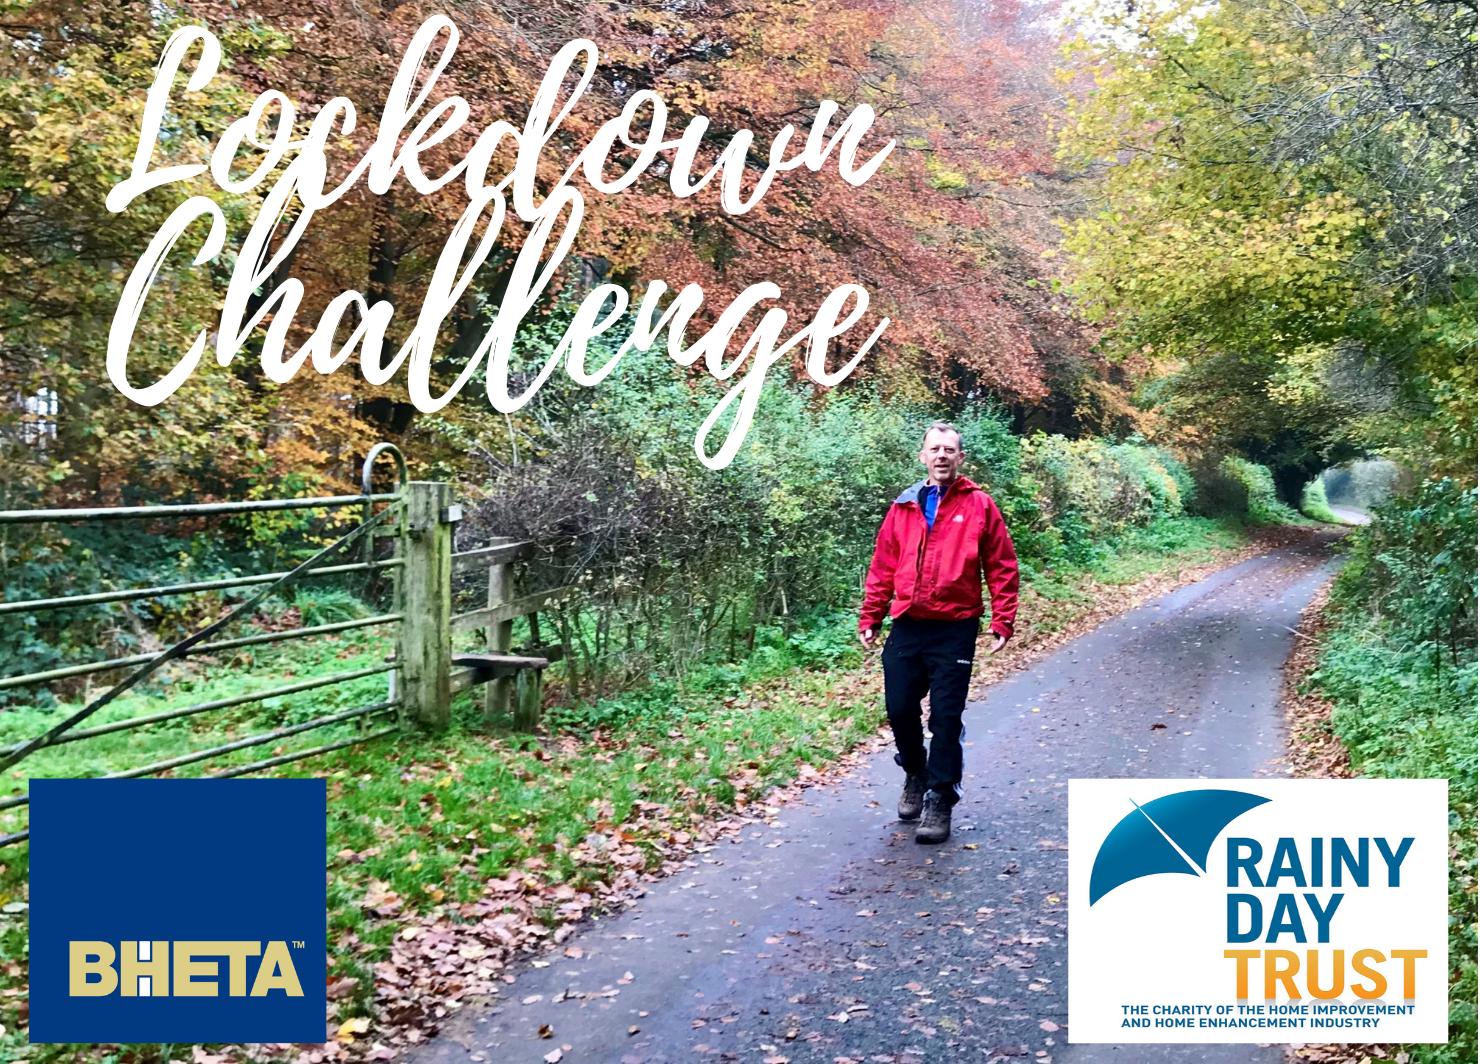 BHETA to 'walk 500 miles' for Rainy Day Trust.